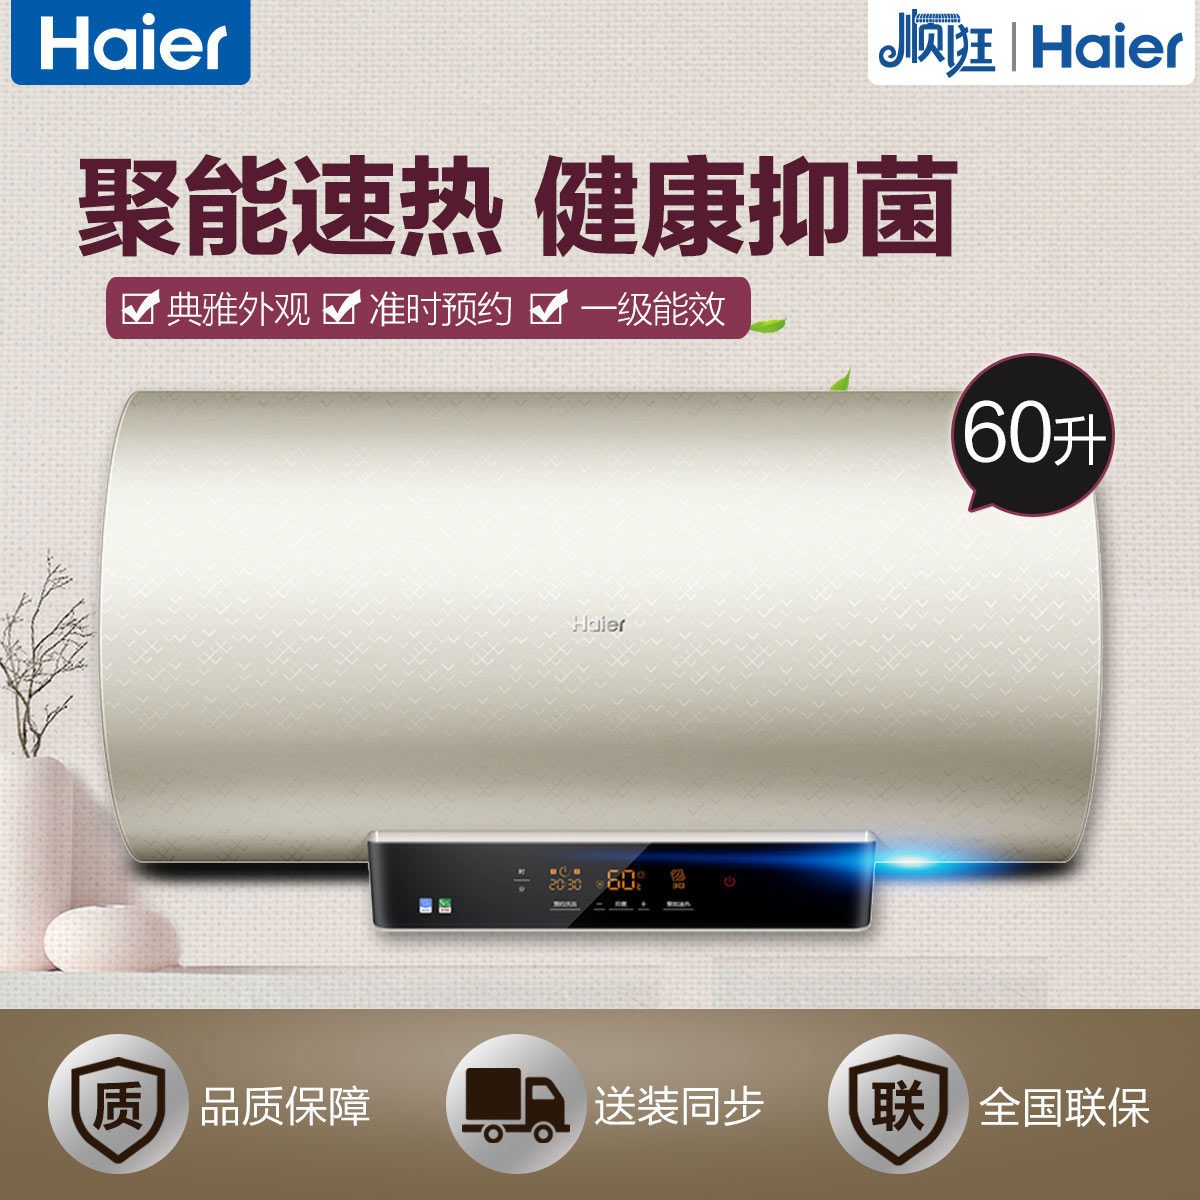 Haier/海尔             热水器             ES60H-K8(ZE)浅啡